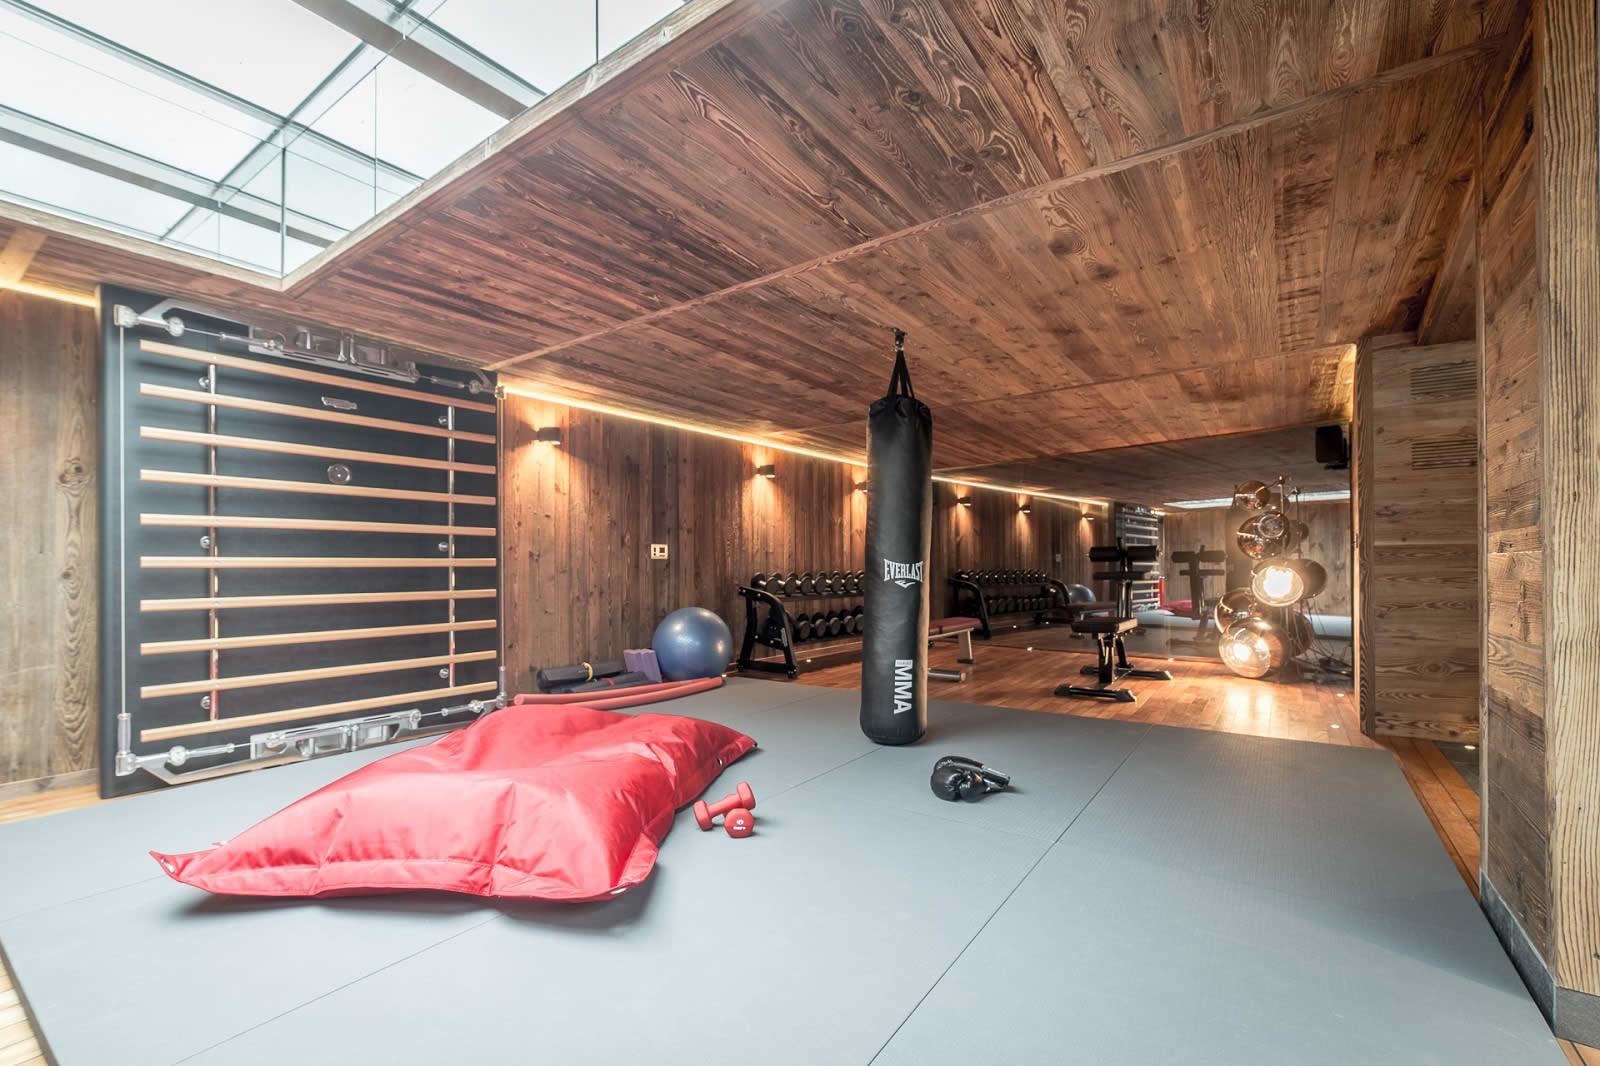 chalet-luxe-a-vendre-piscine-sauna-hammam-jacuzzi